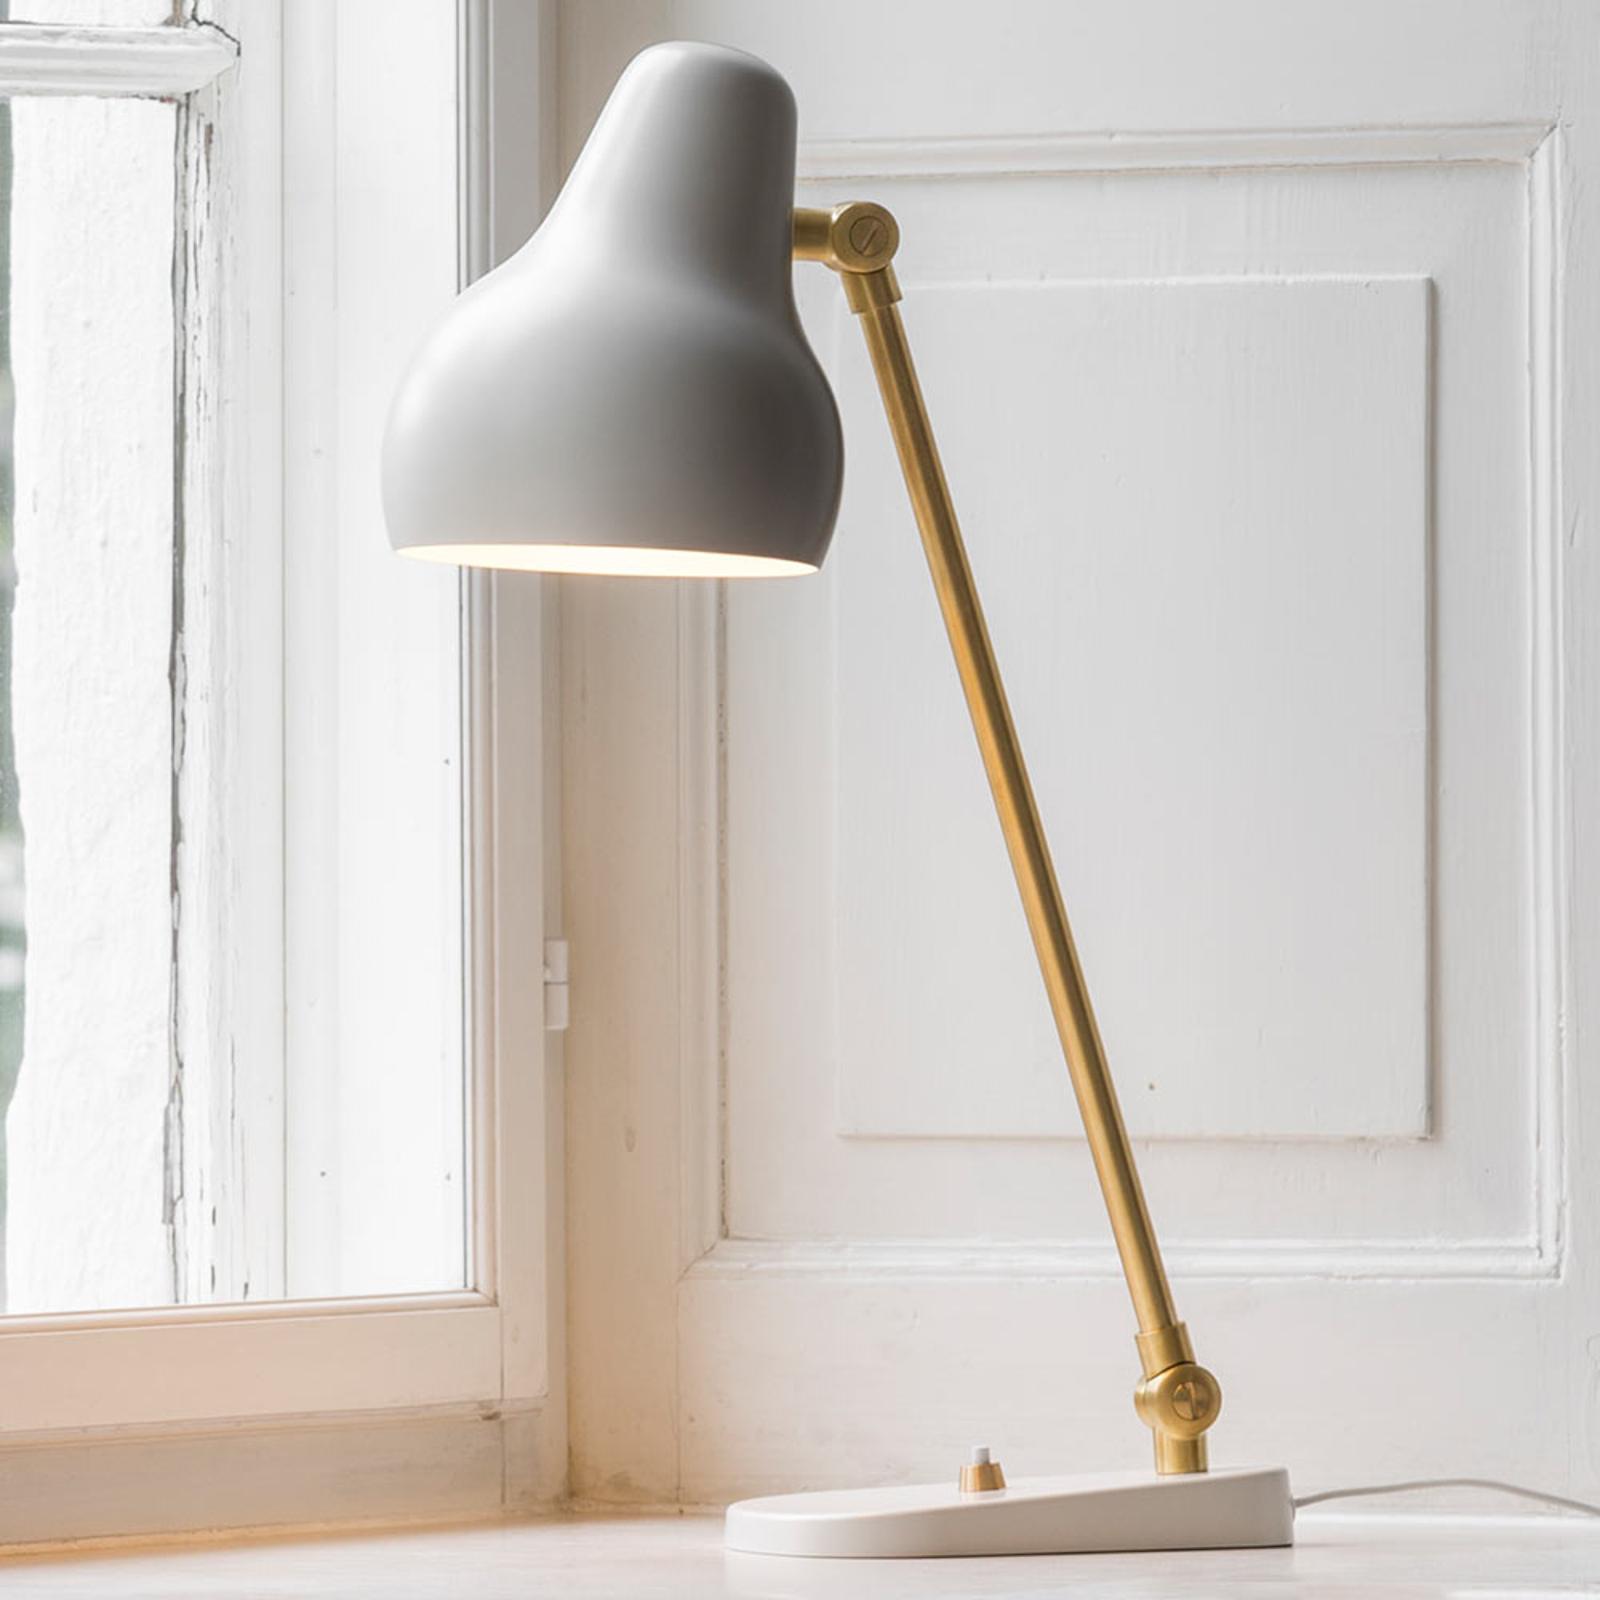 Louis Poulsen VL38 – LED-bordslampa, vit